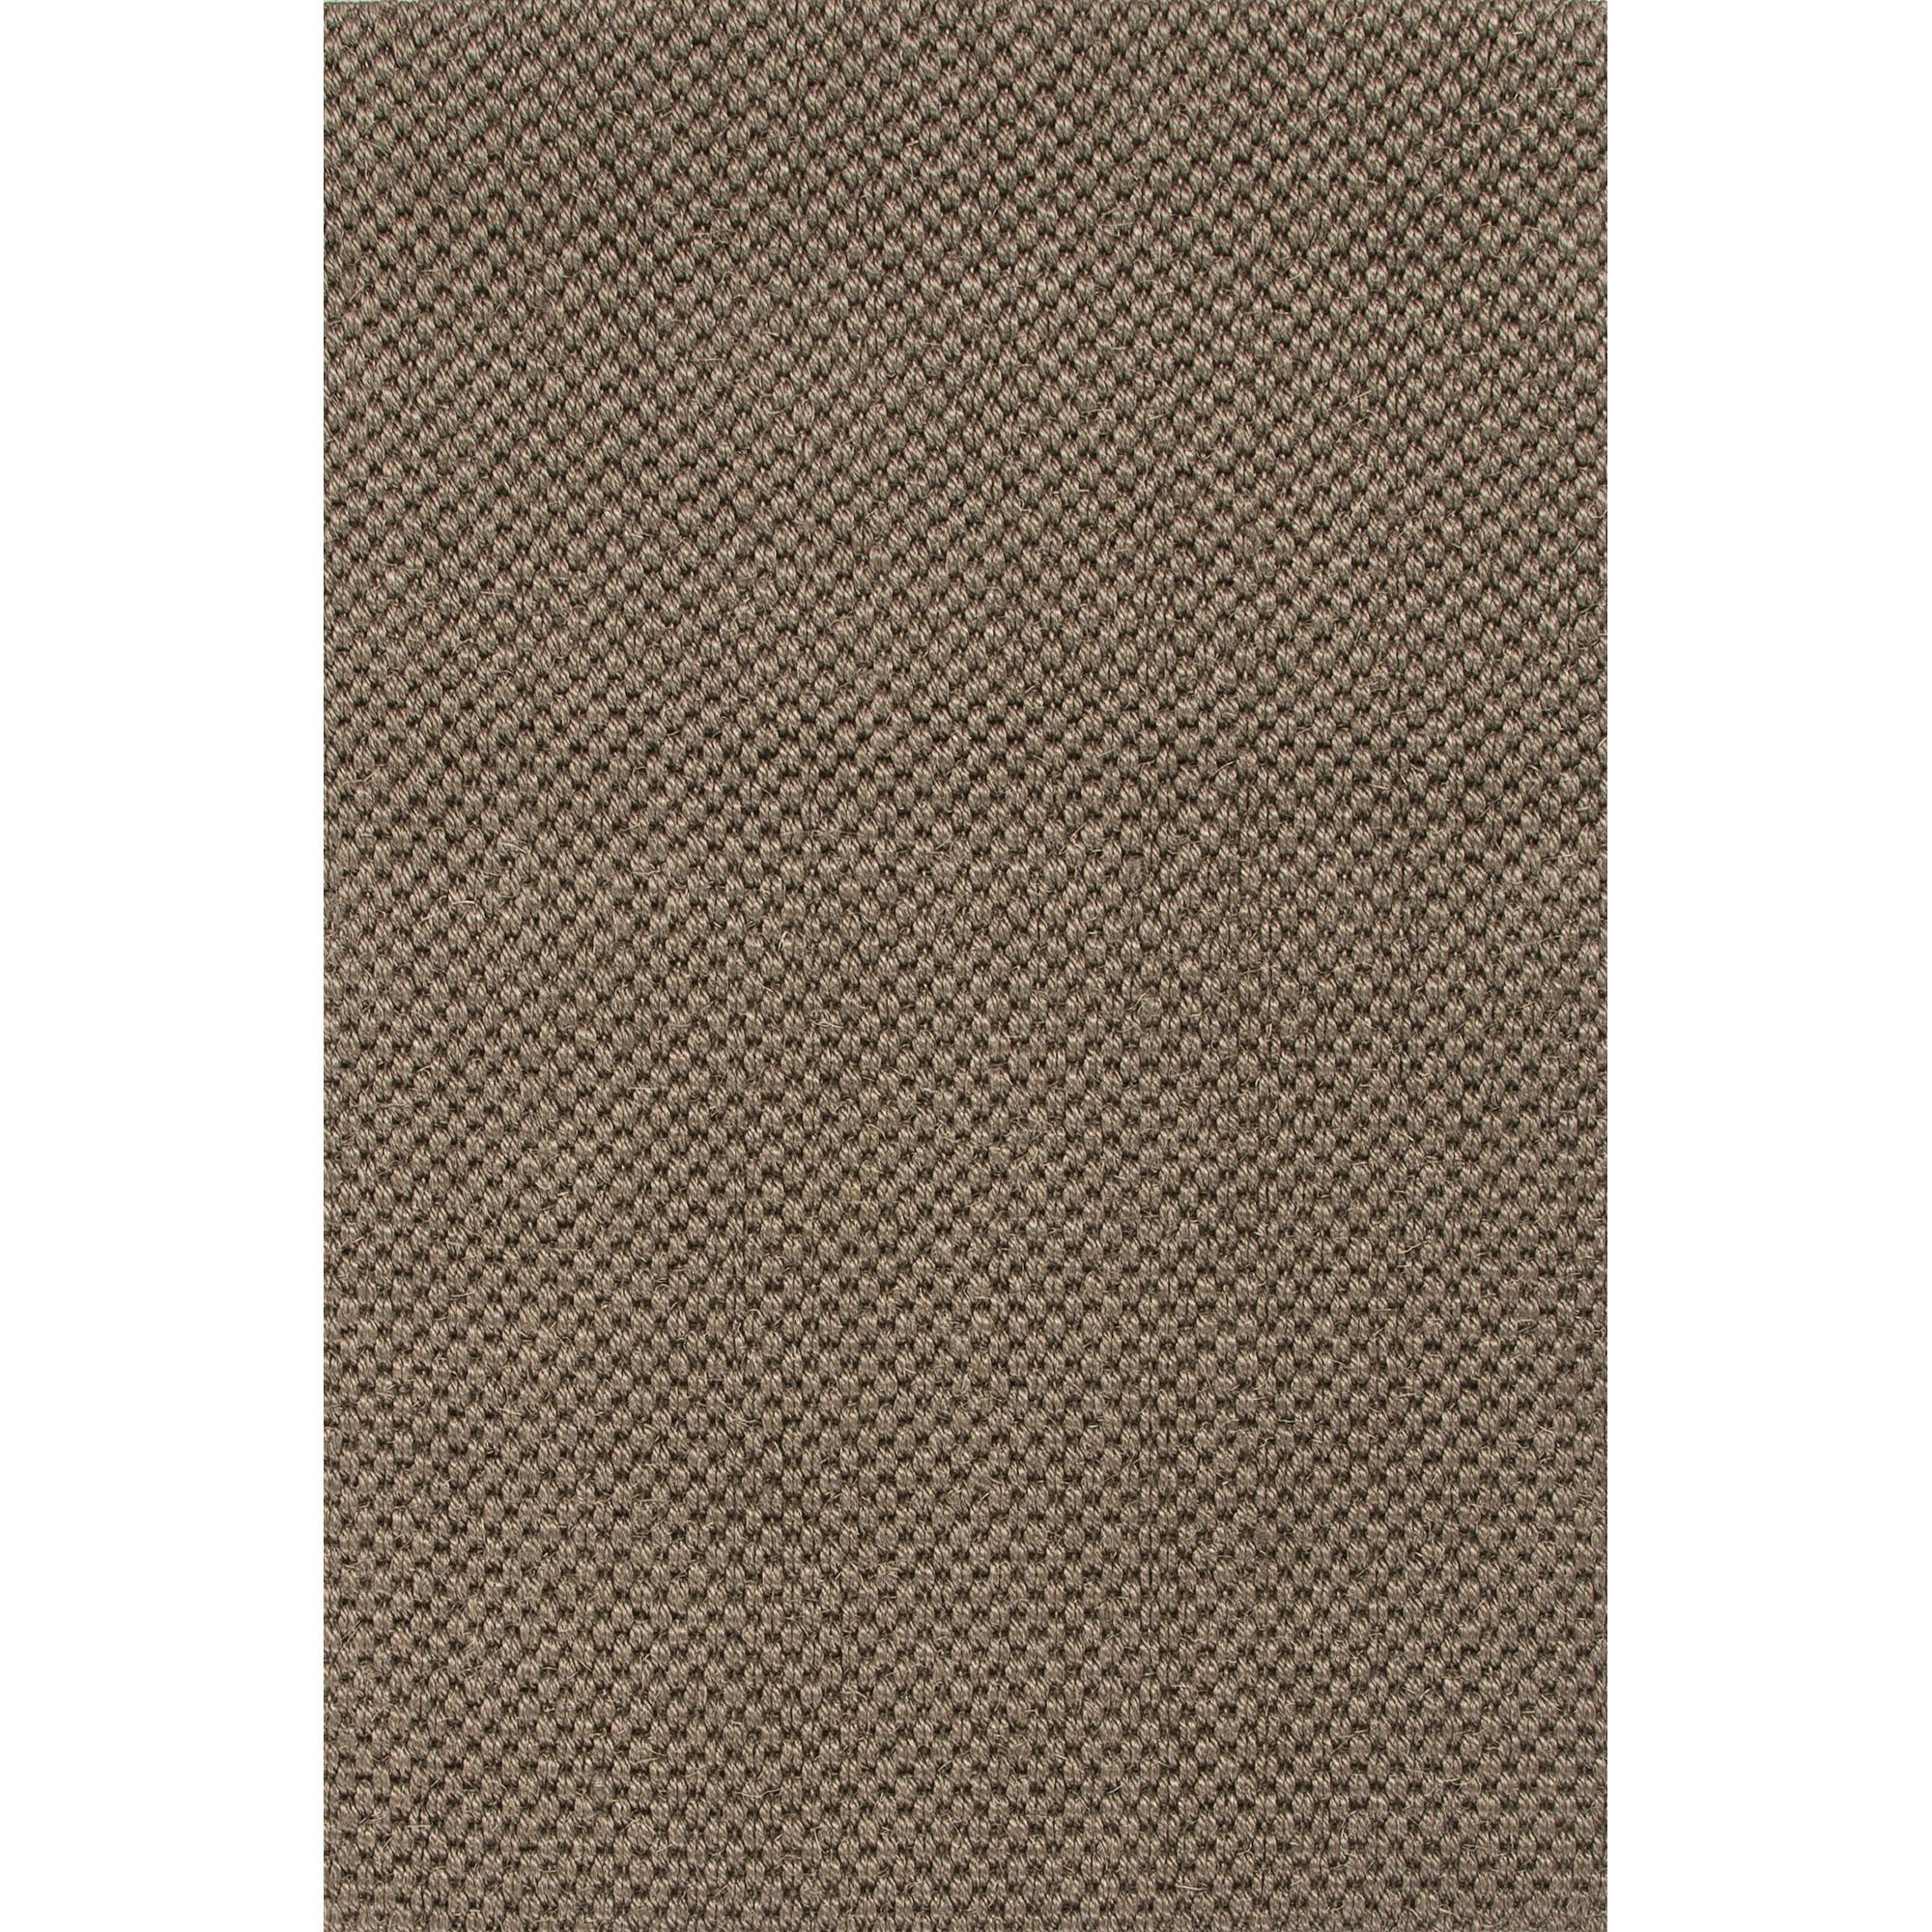 JAIPUR Rugs Naturals Sanibel 9 x 12 Rug - Item Number: RUG119166